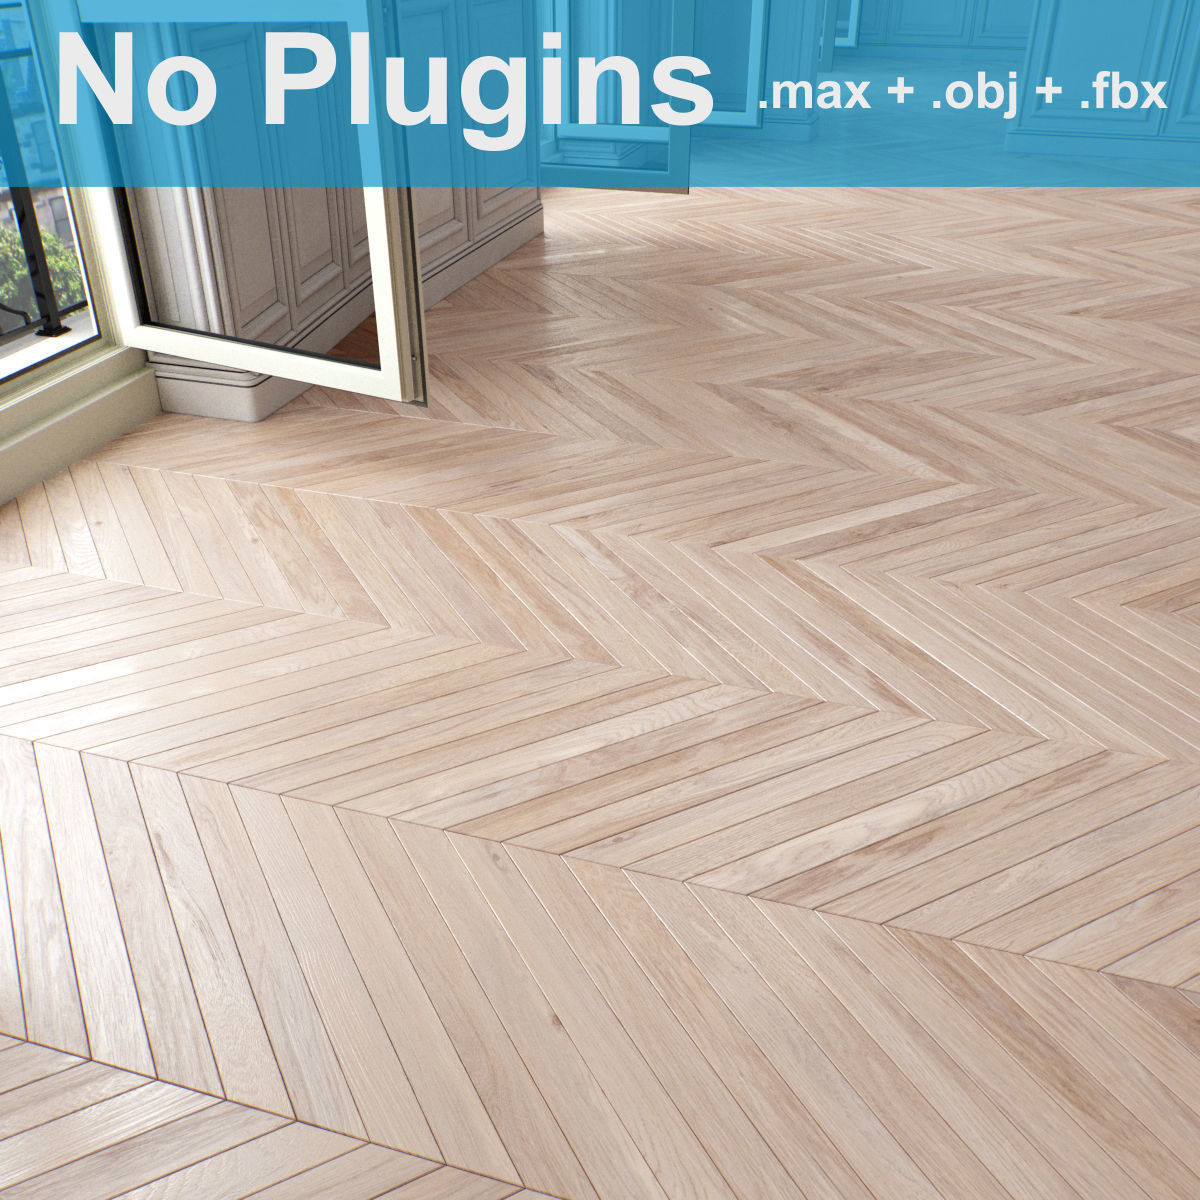 Floor for variatio 1-7